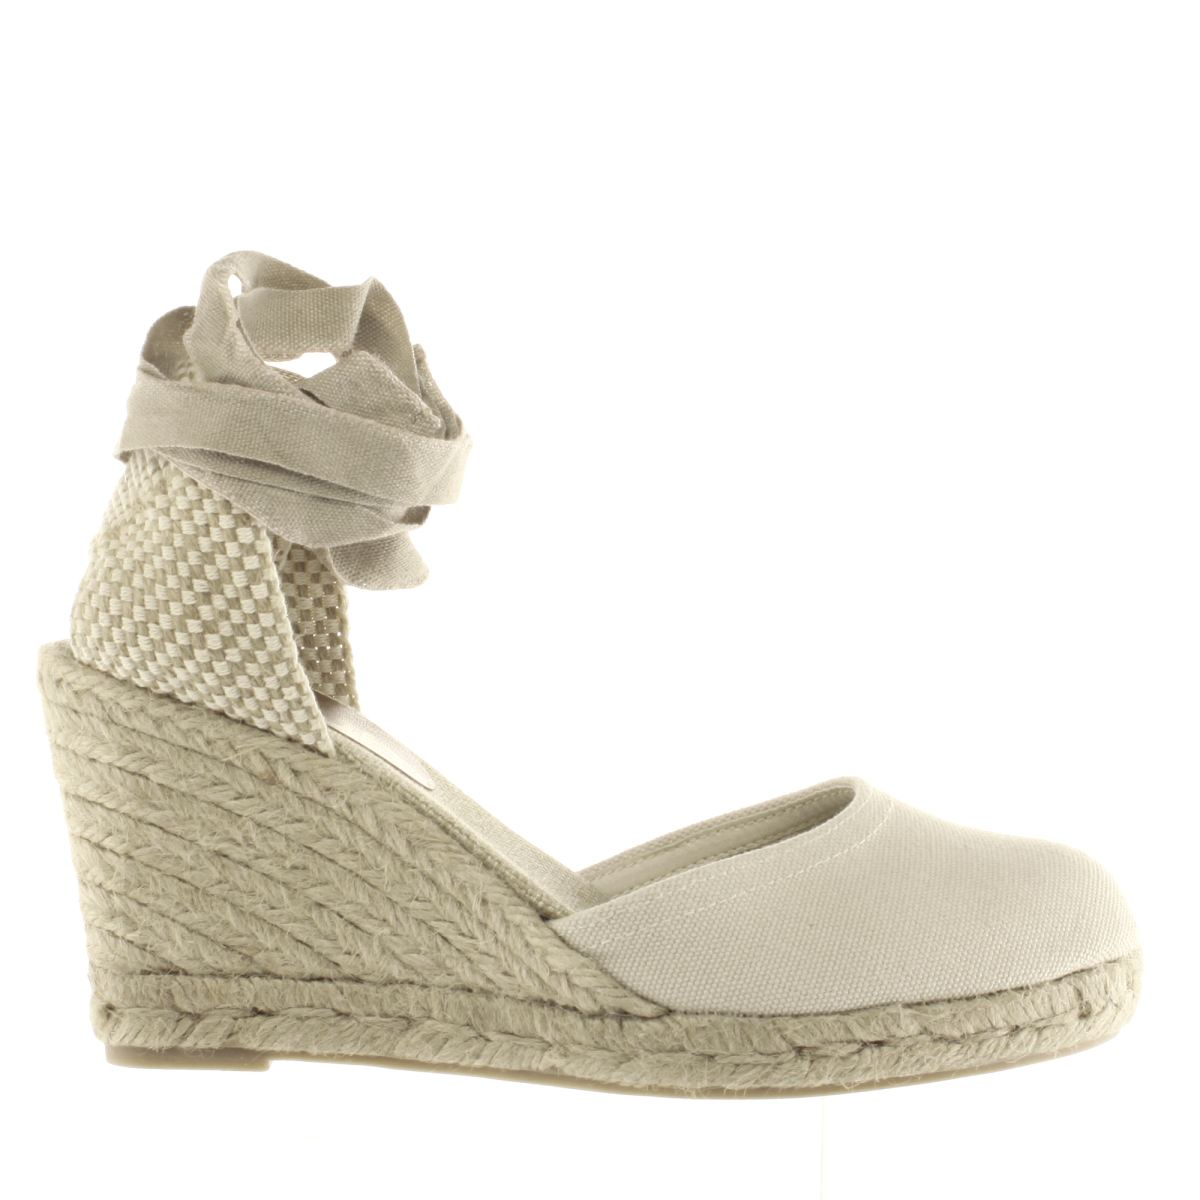 schuh stone parade sandals